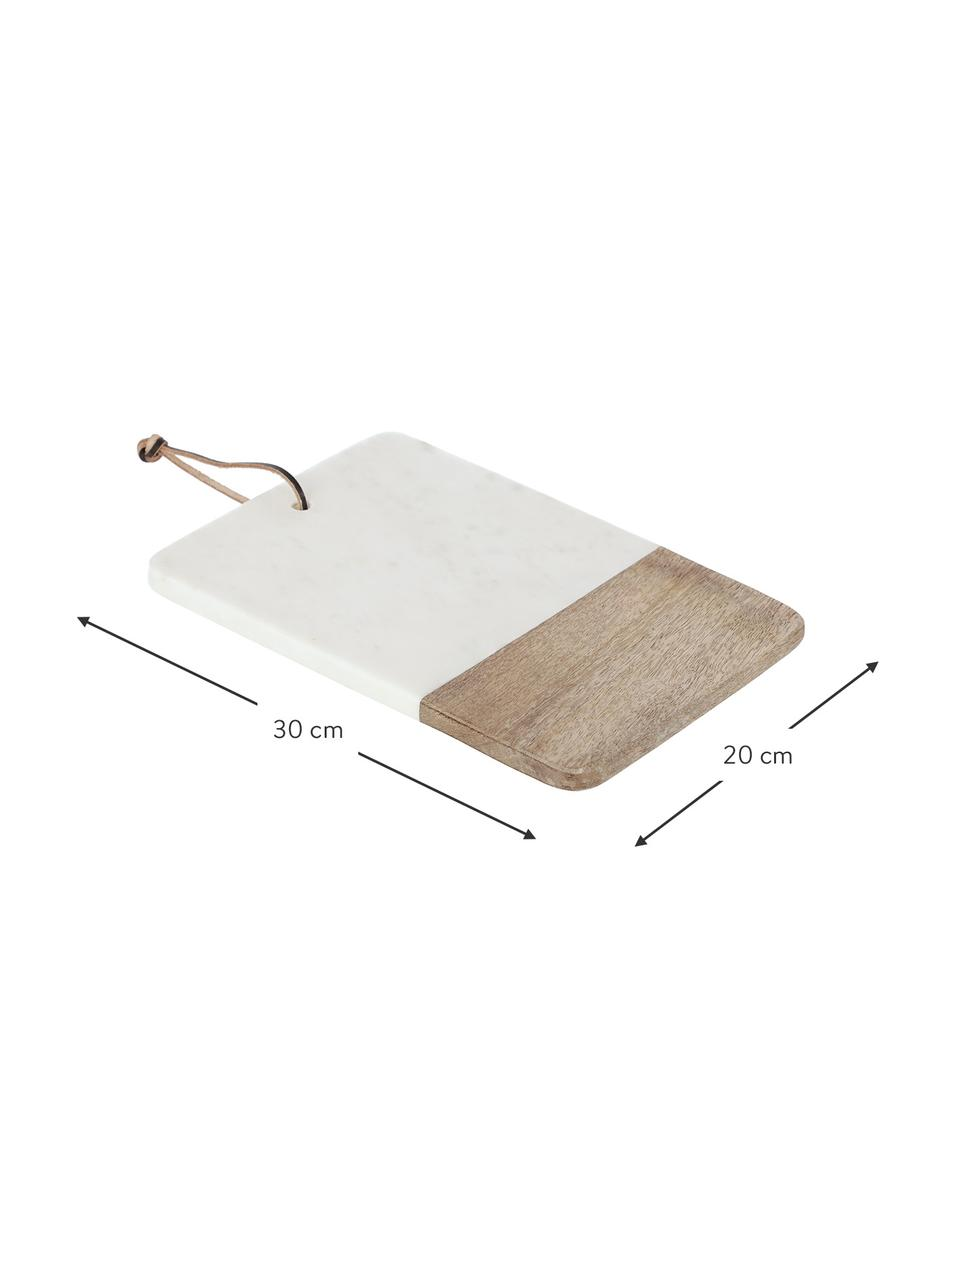 Marmeren snijplank Danelle, L 30 x B 20 cm, Ophanglus: kunstleer, Mangohout, wit, gemarmerd, 20 x 30 cm